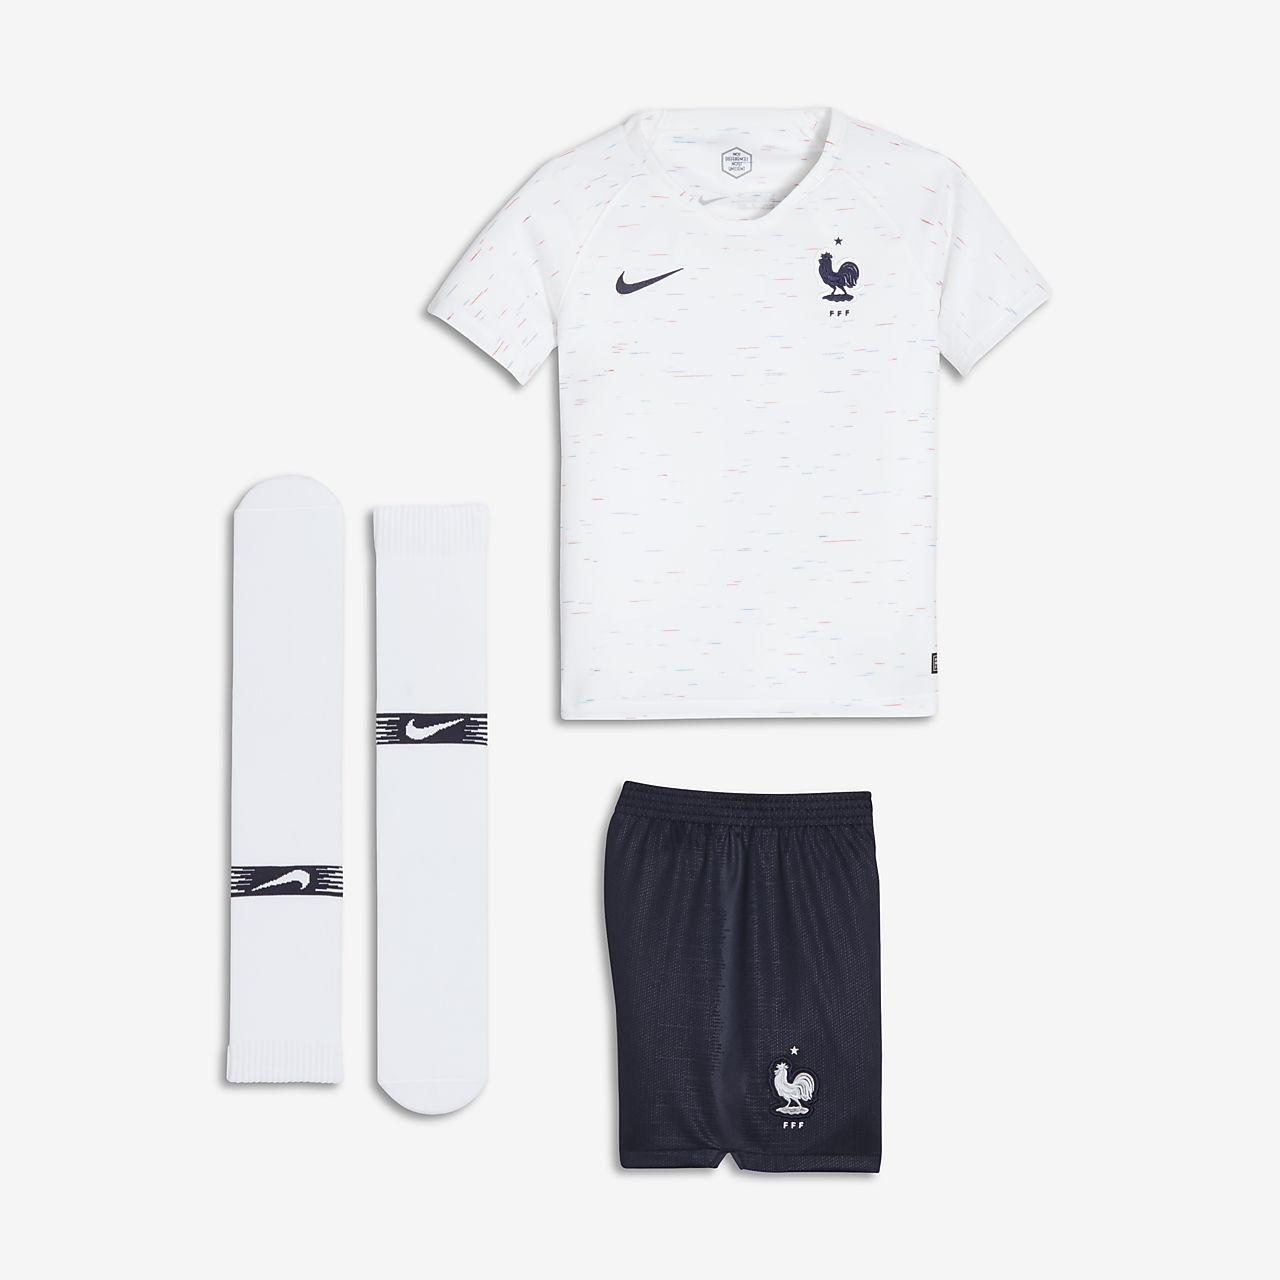 fff kit